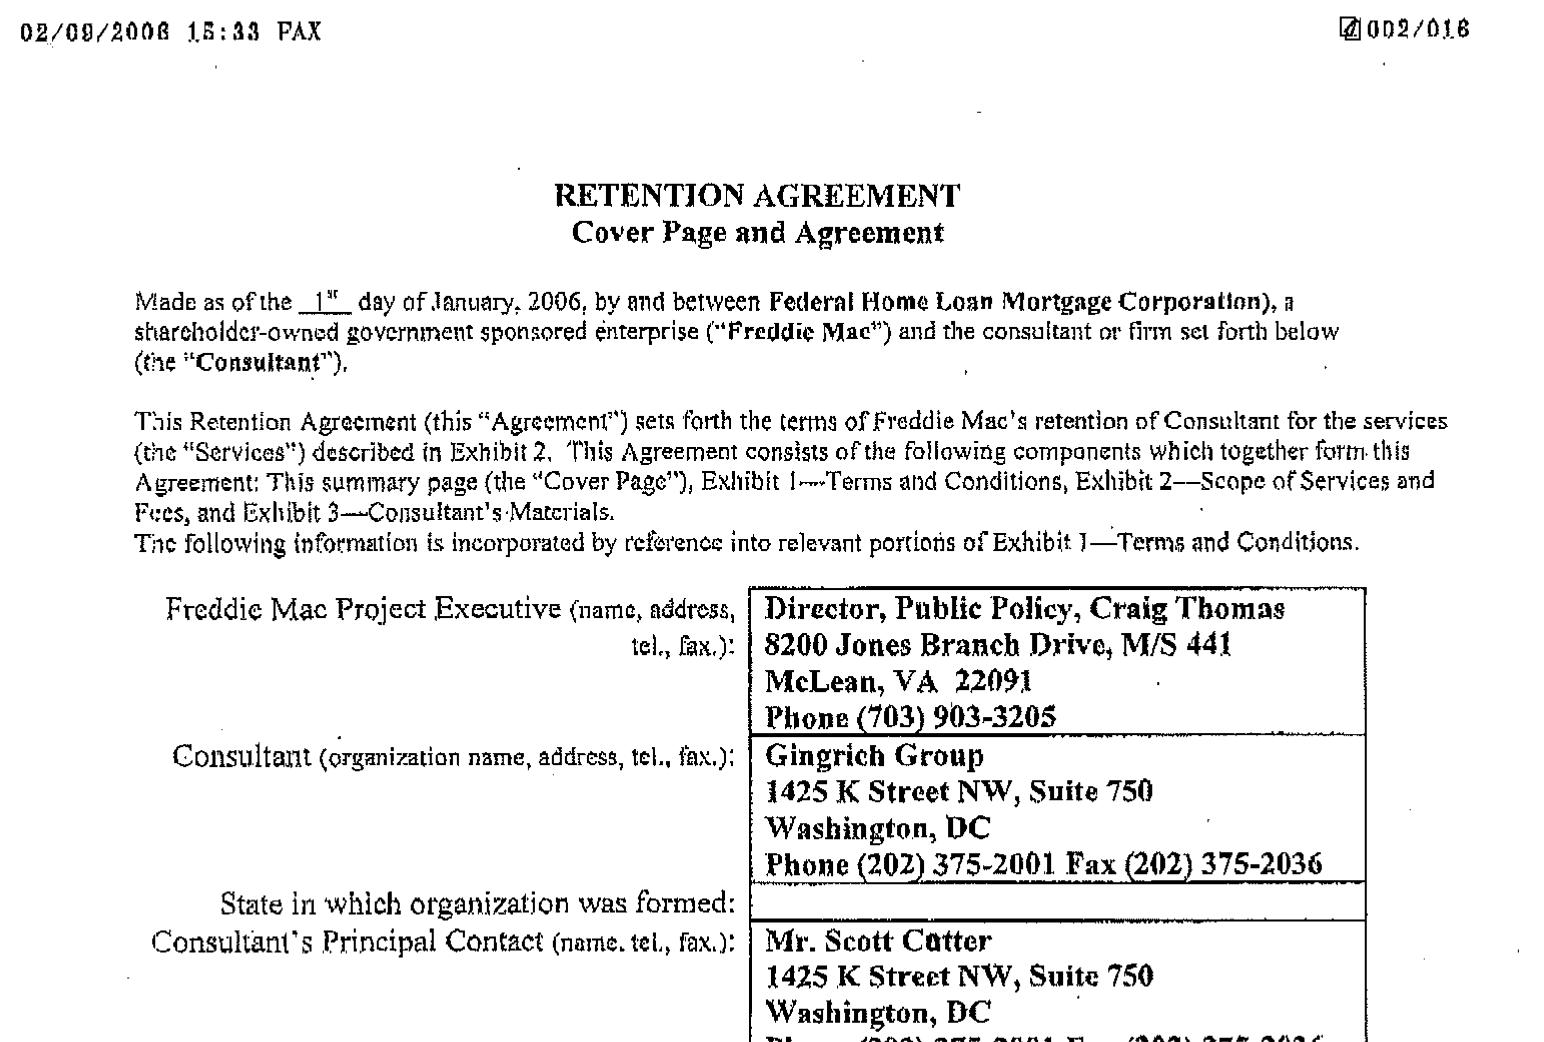 BREAKING: Newt Gingrich releases Freddie Mac contract